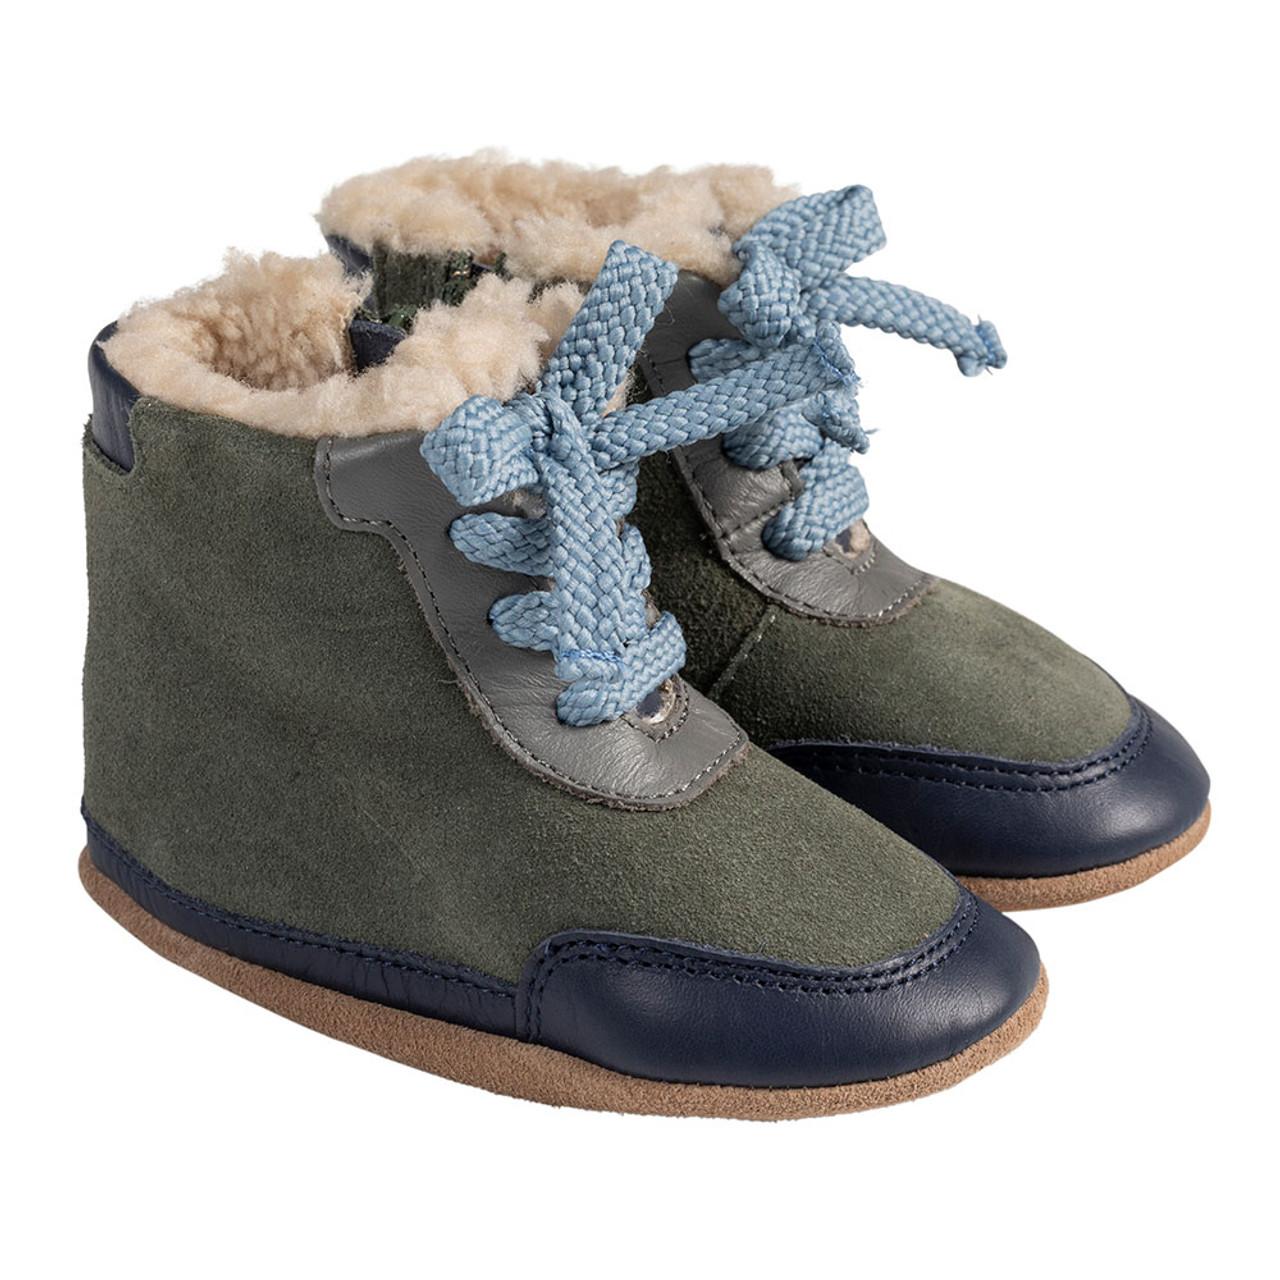 Green Wyatt Boots   Soft Soles   Baby